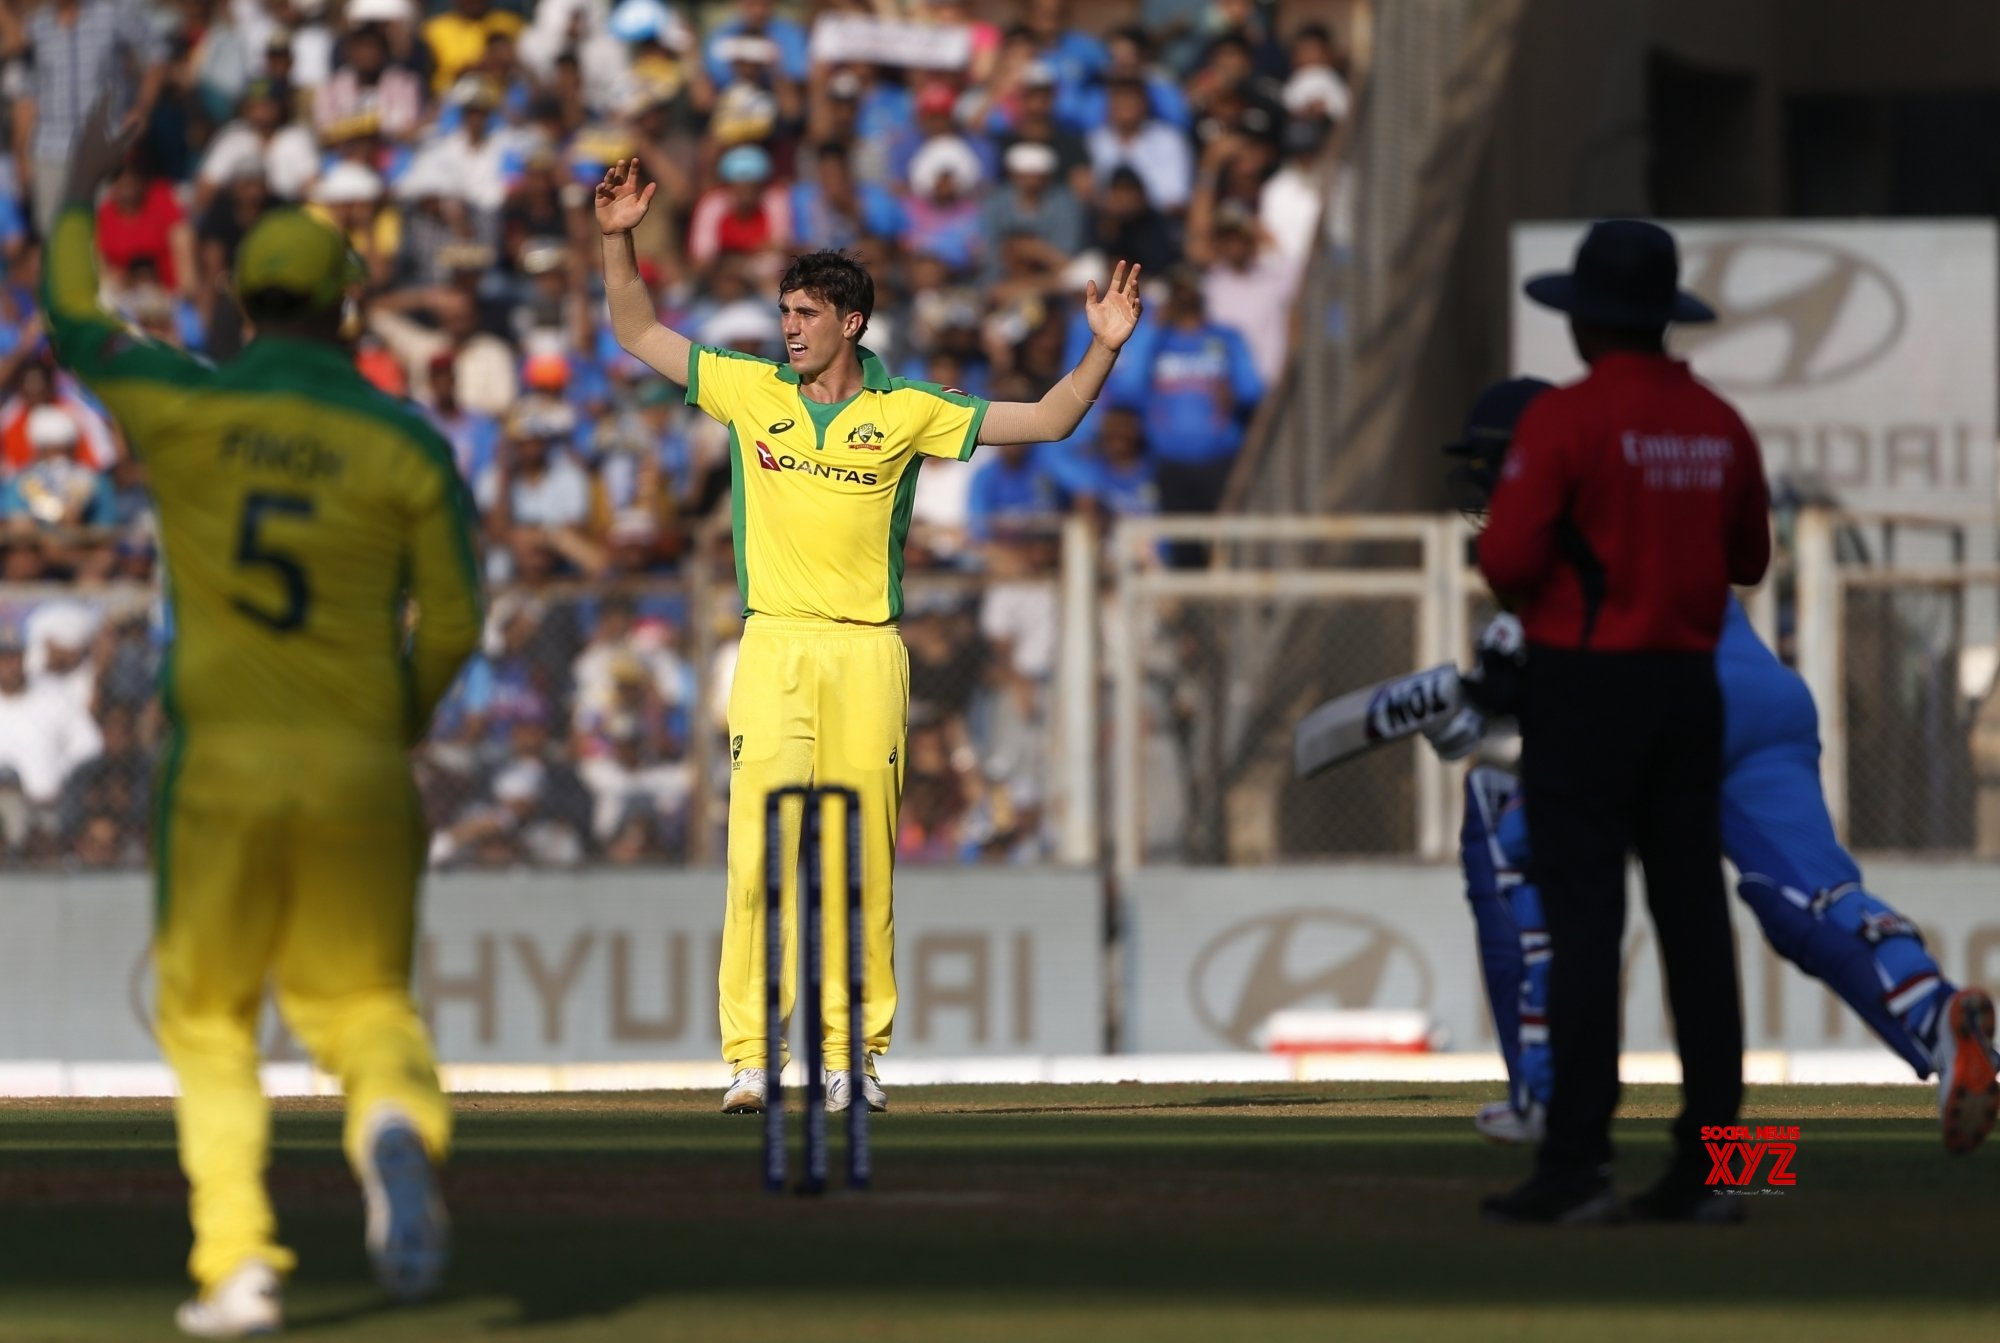 Mumbai: 1st ODI - India Vs Australia (Batch - 28) #Gallery